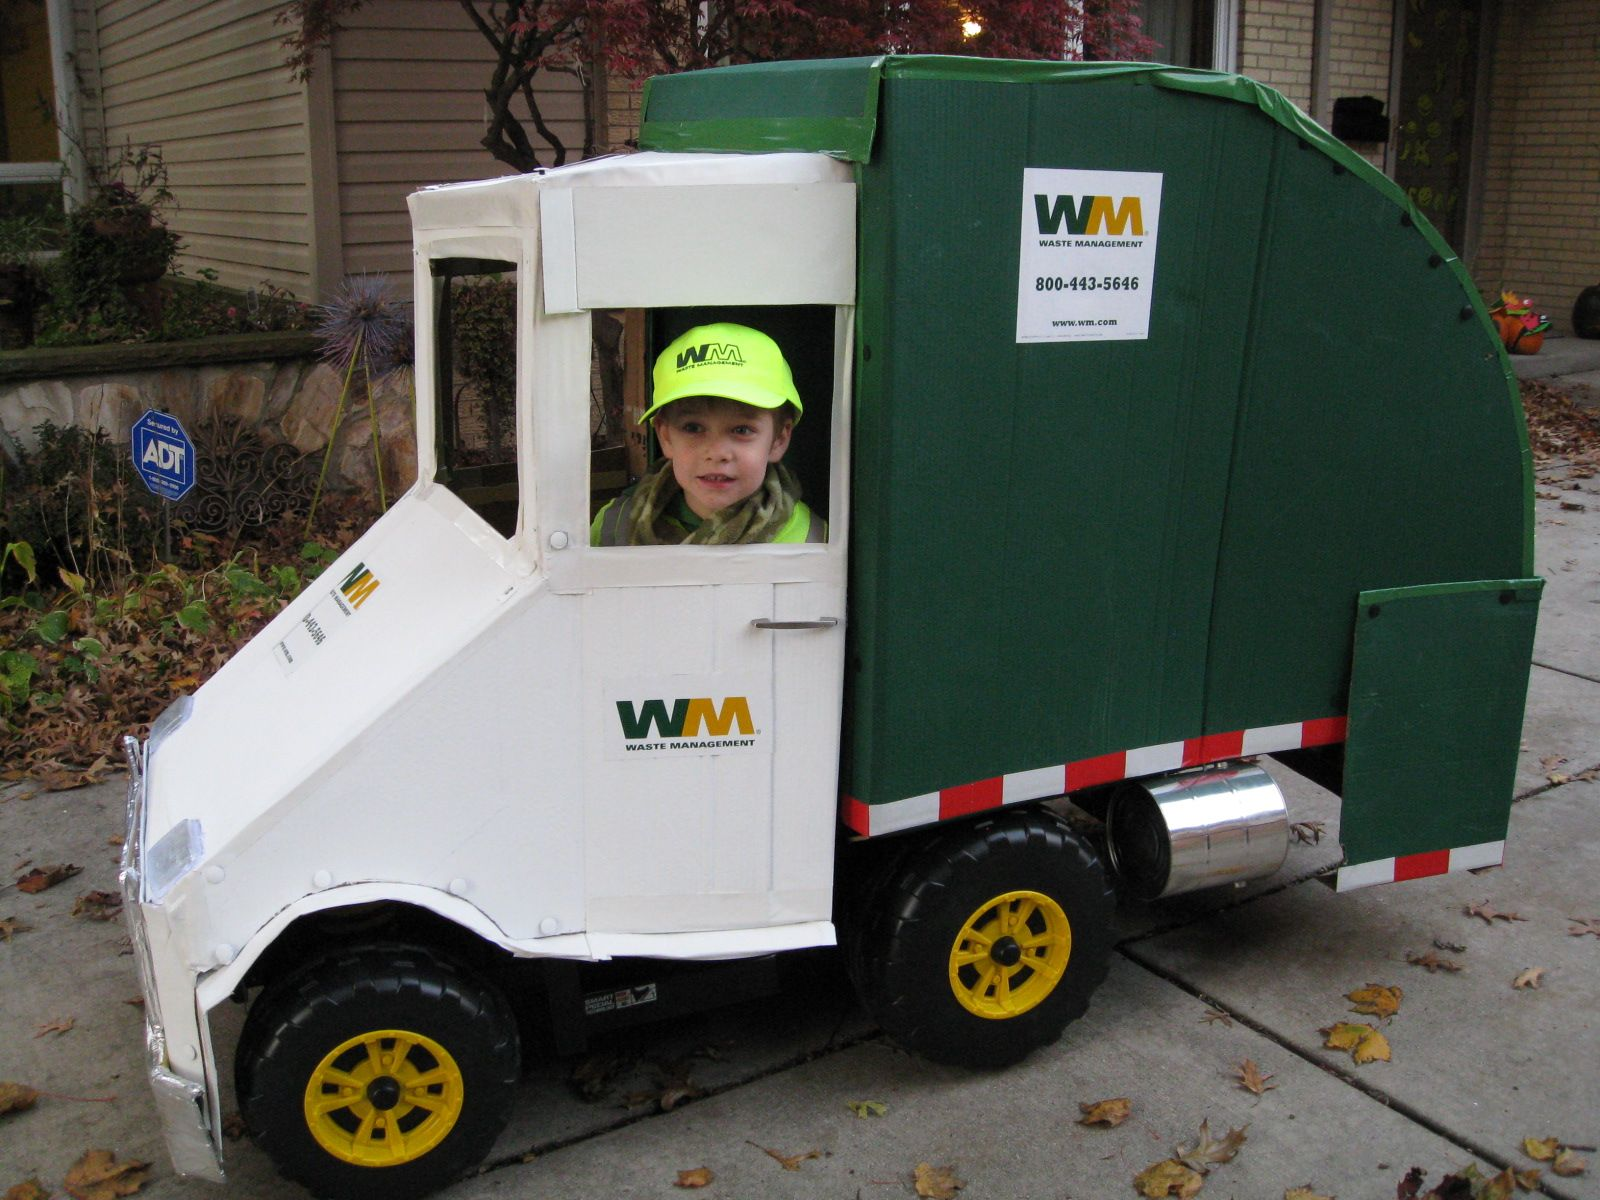 Garbage truck Halloween costume | CARDBOARD CREATIONS | Pinterest ...